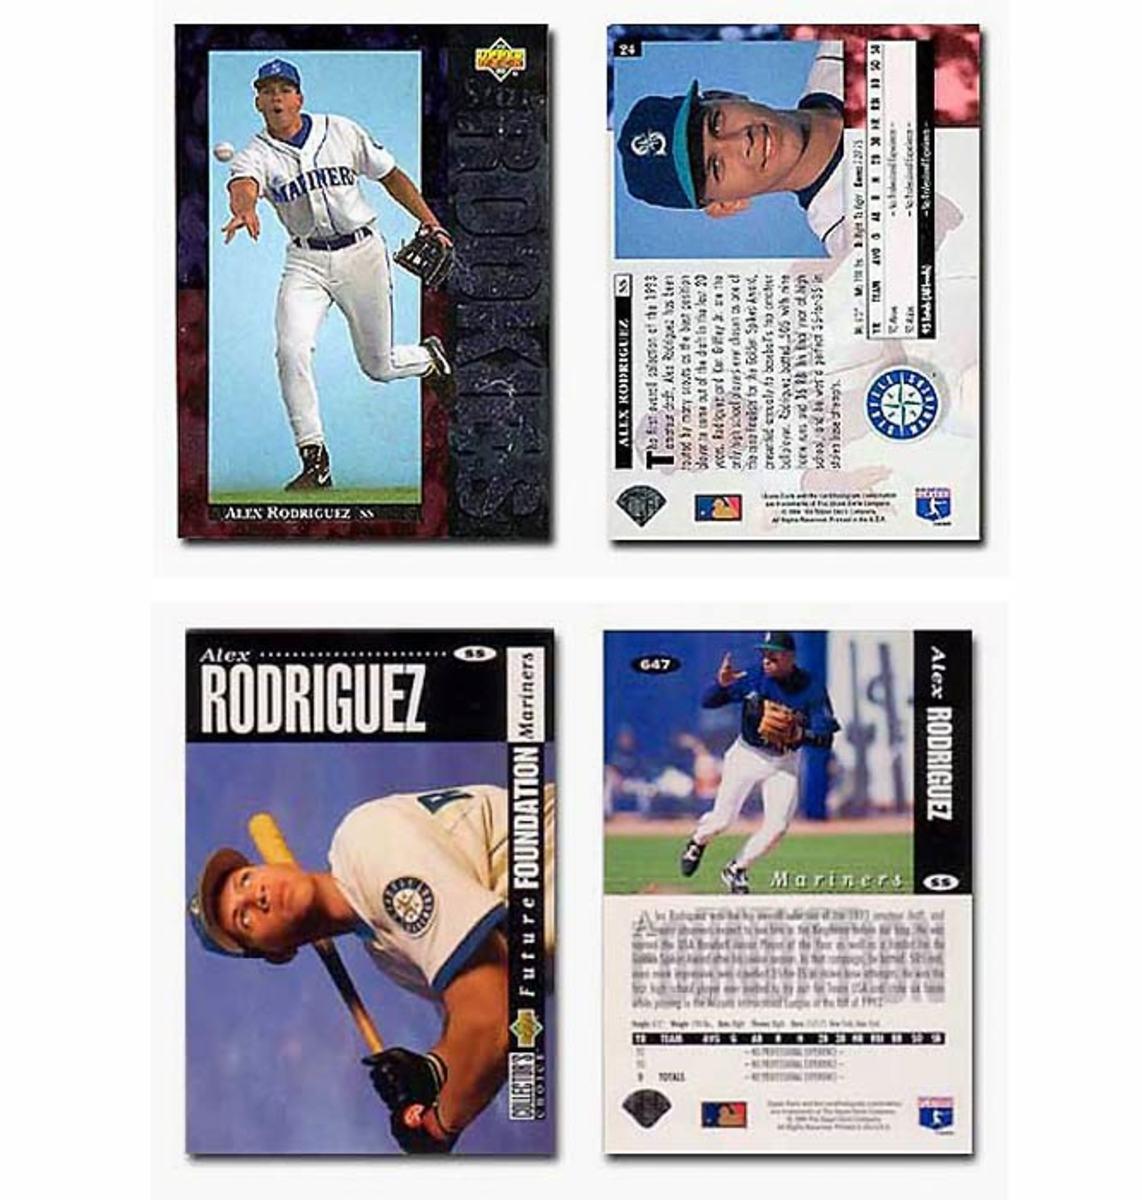 (Top) 1994 Upper Deck Alex Rodriguez Rookie Card #24